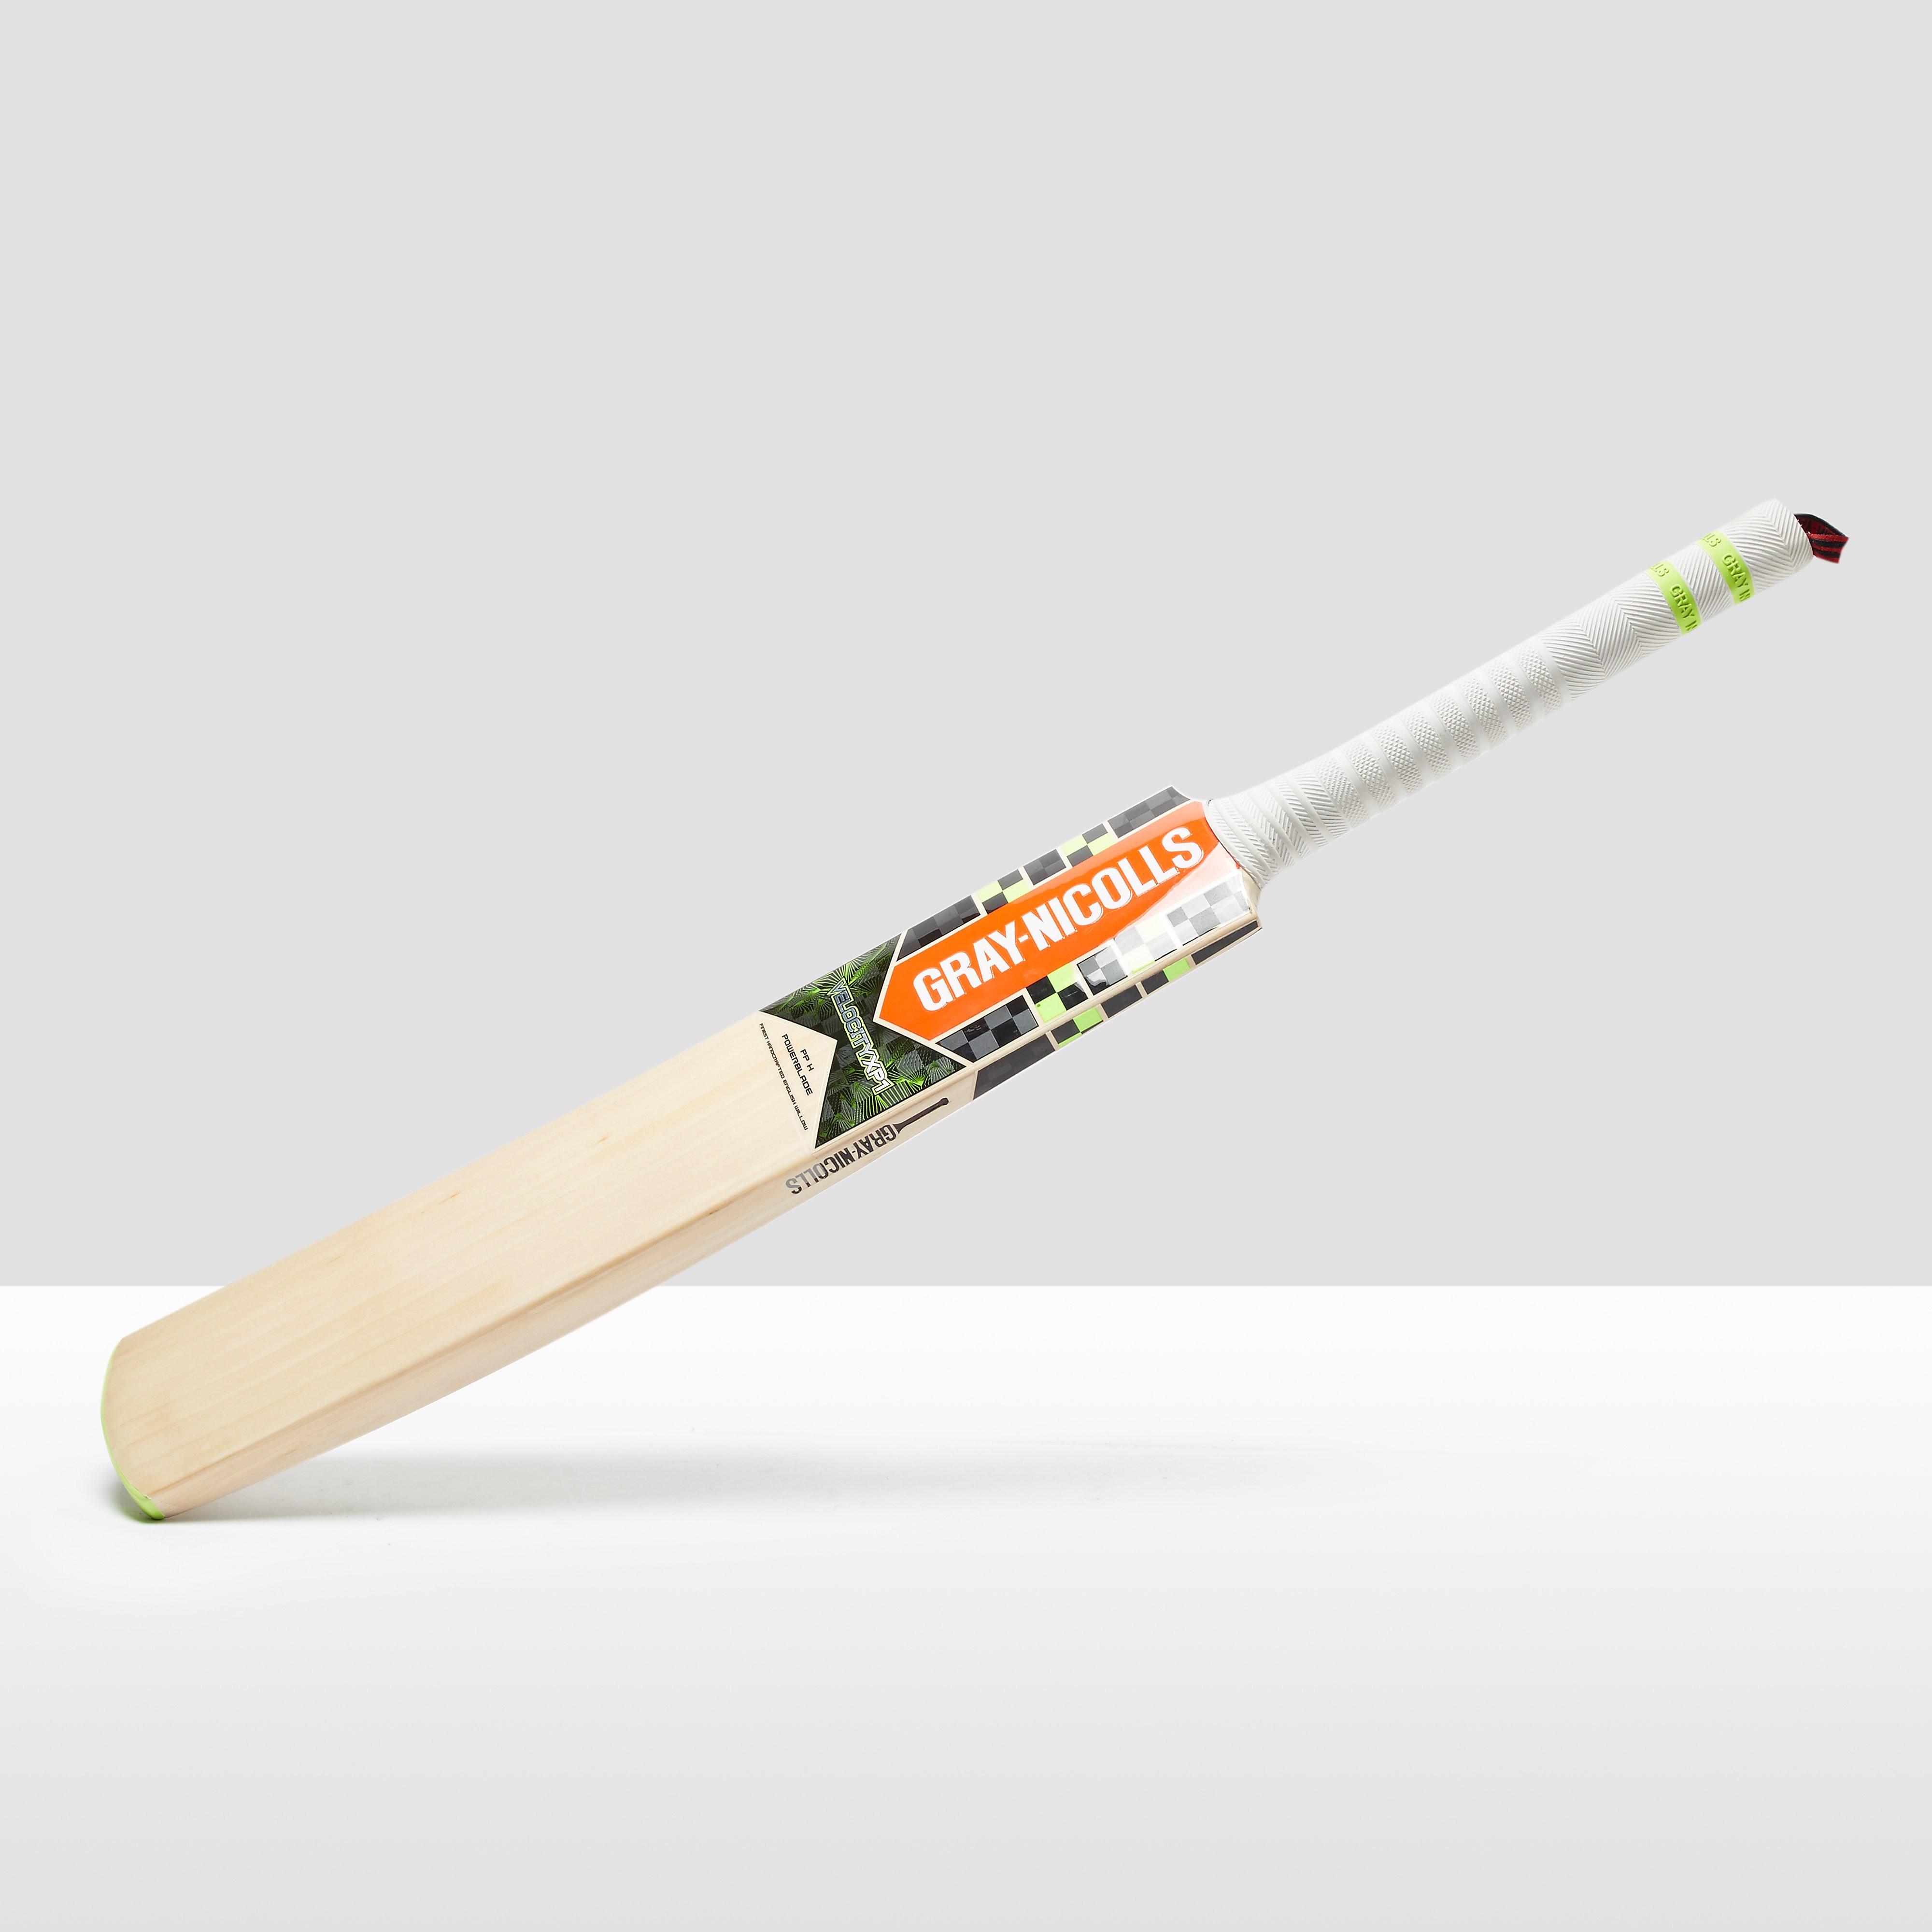 Gray Nicolls Velocity XP1 Powerblade Junior Cricket Bat